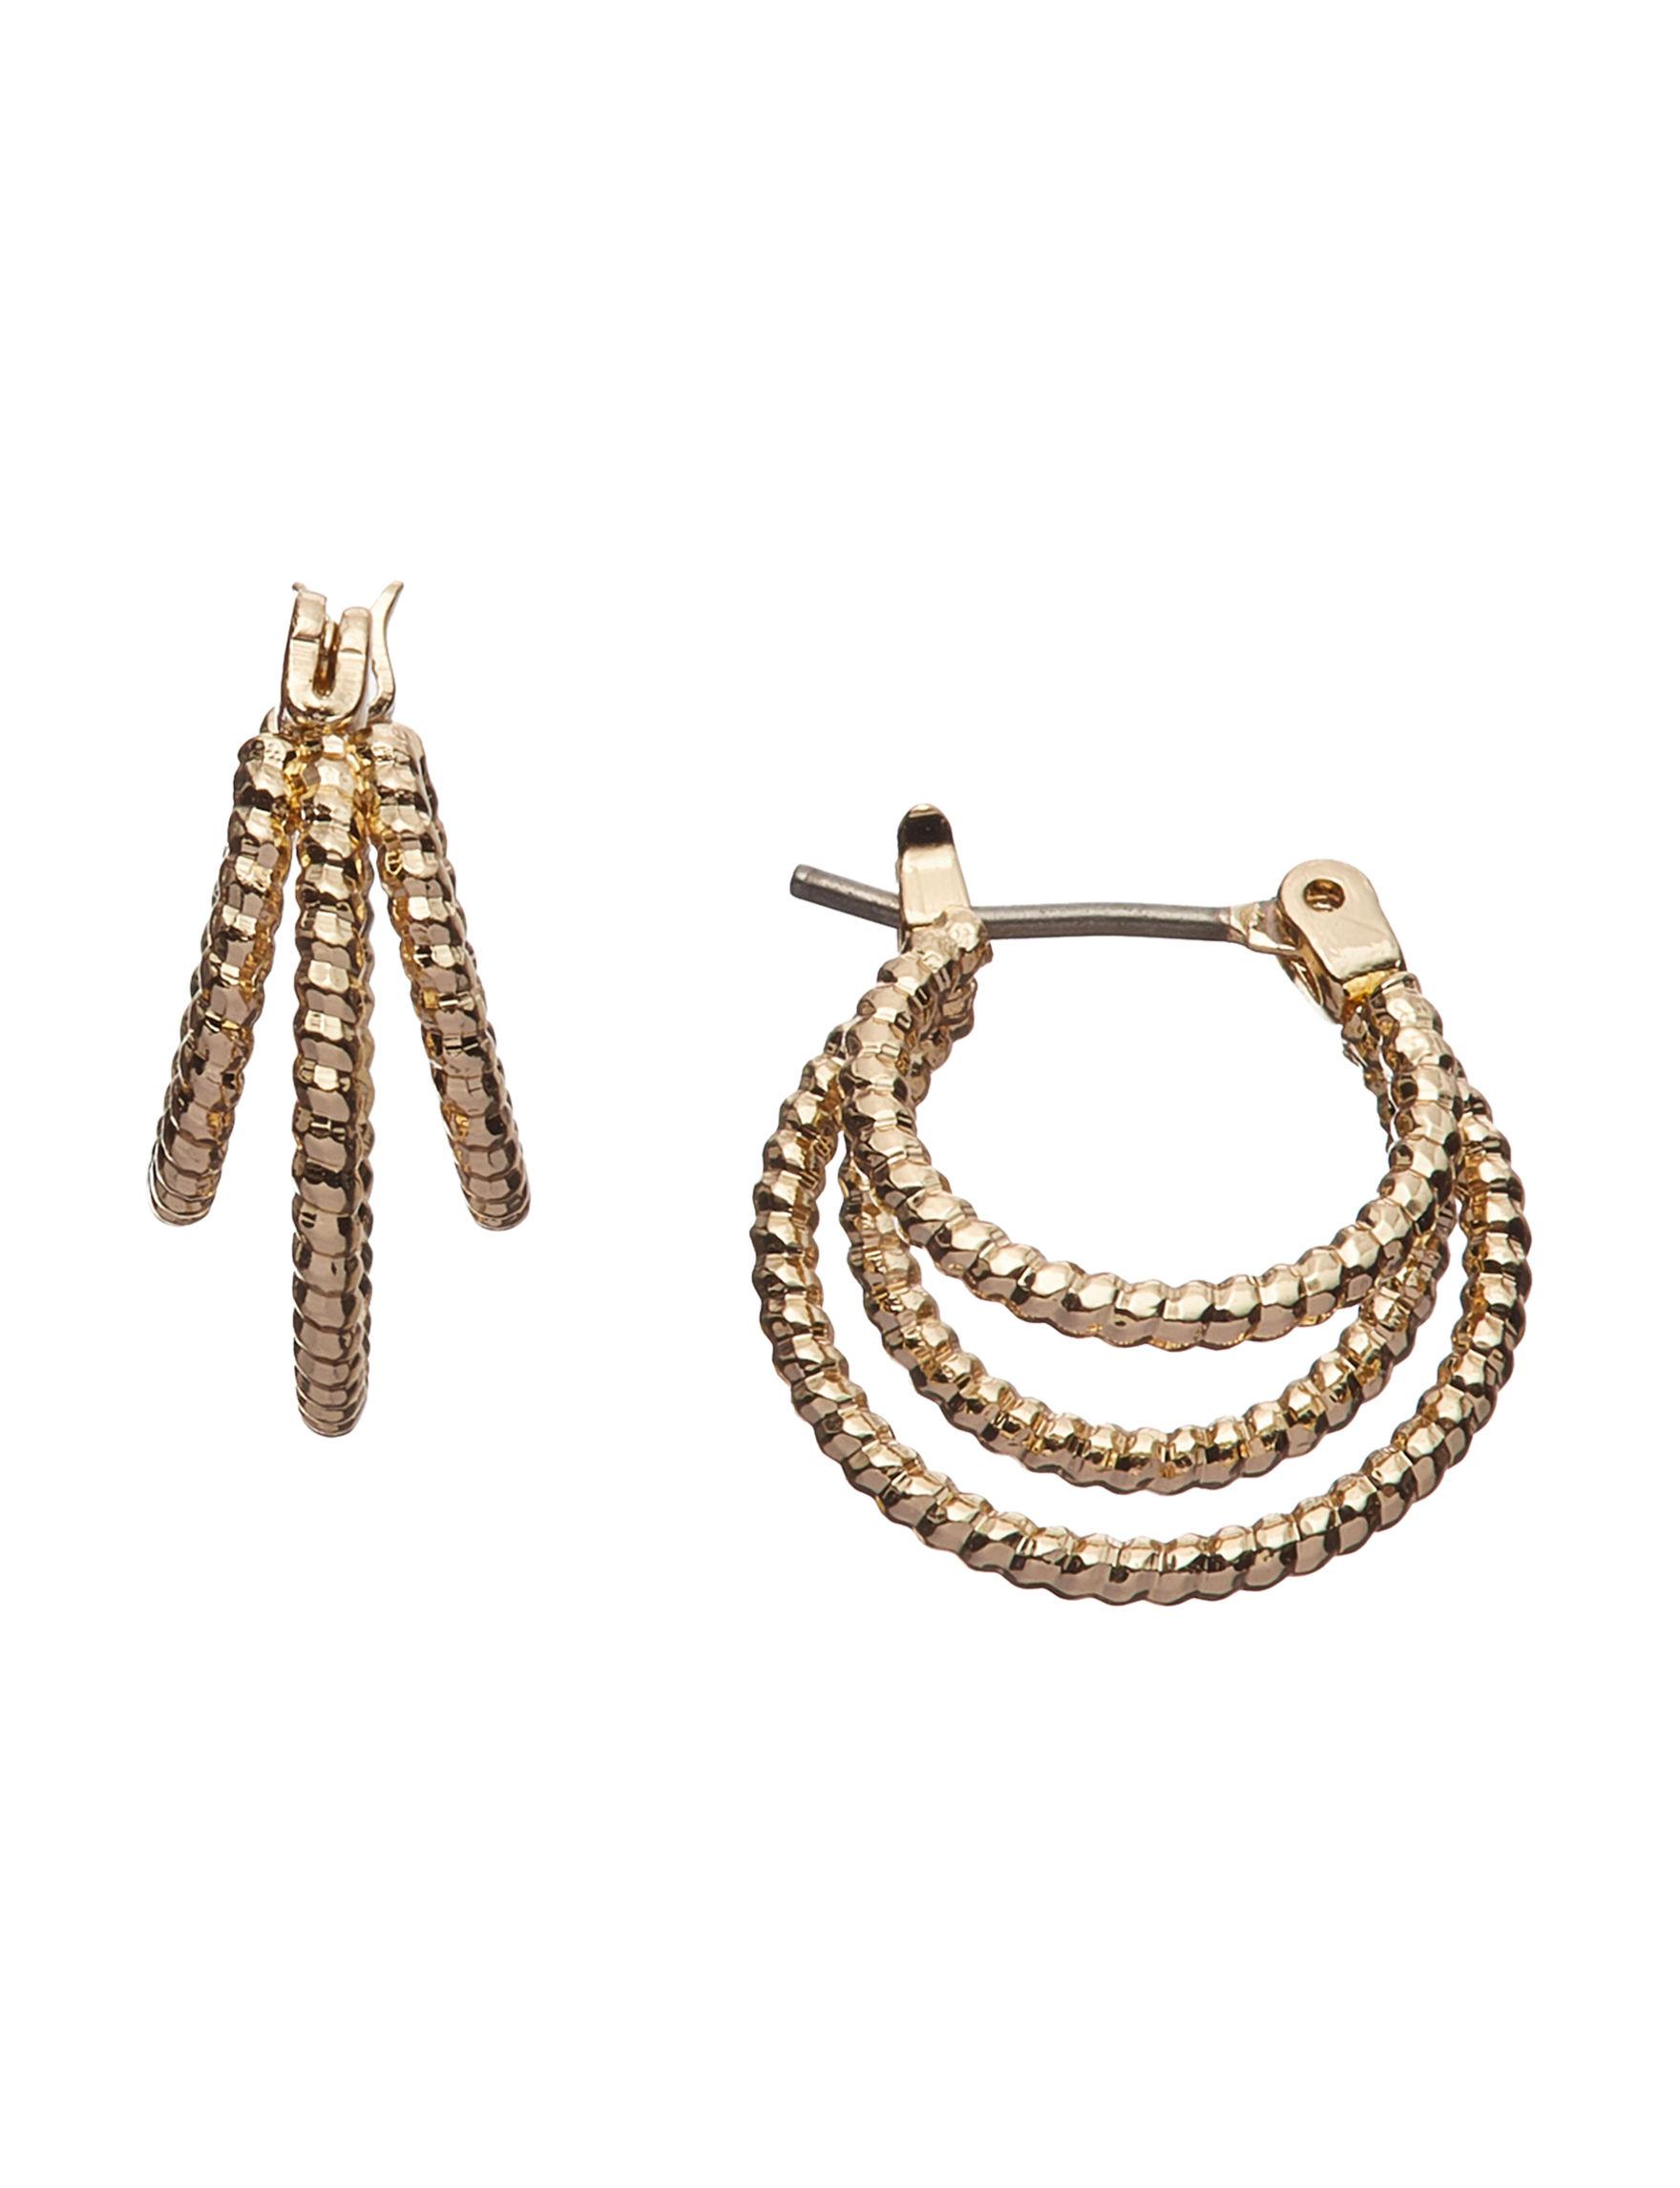 Napier Gold Hoops Earrings Fashion Jewelry